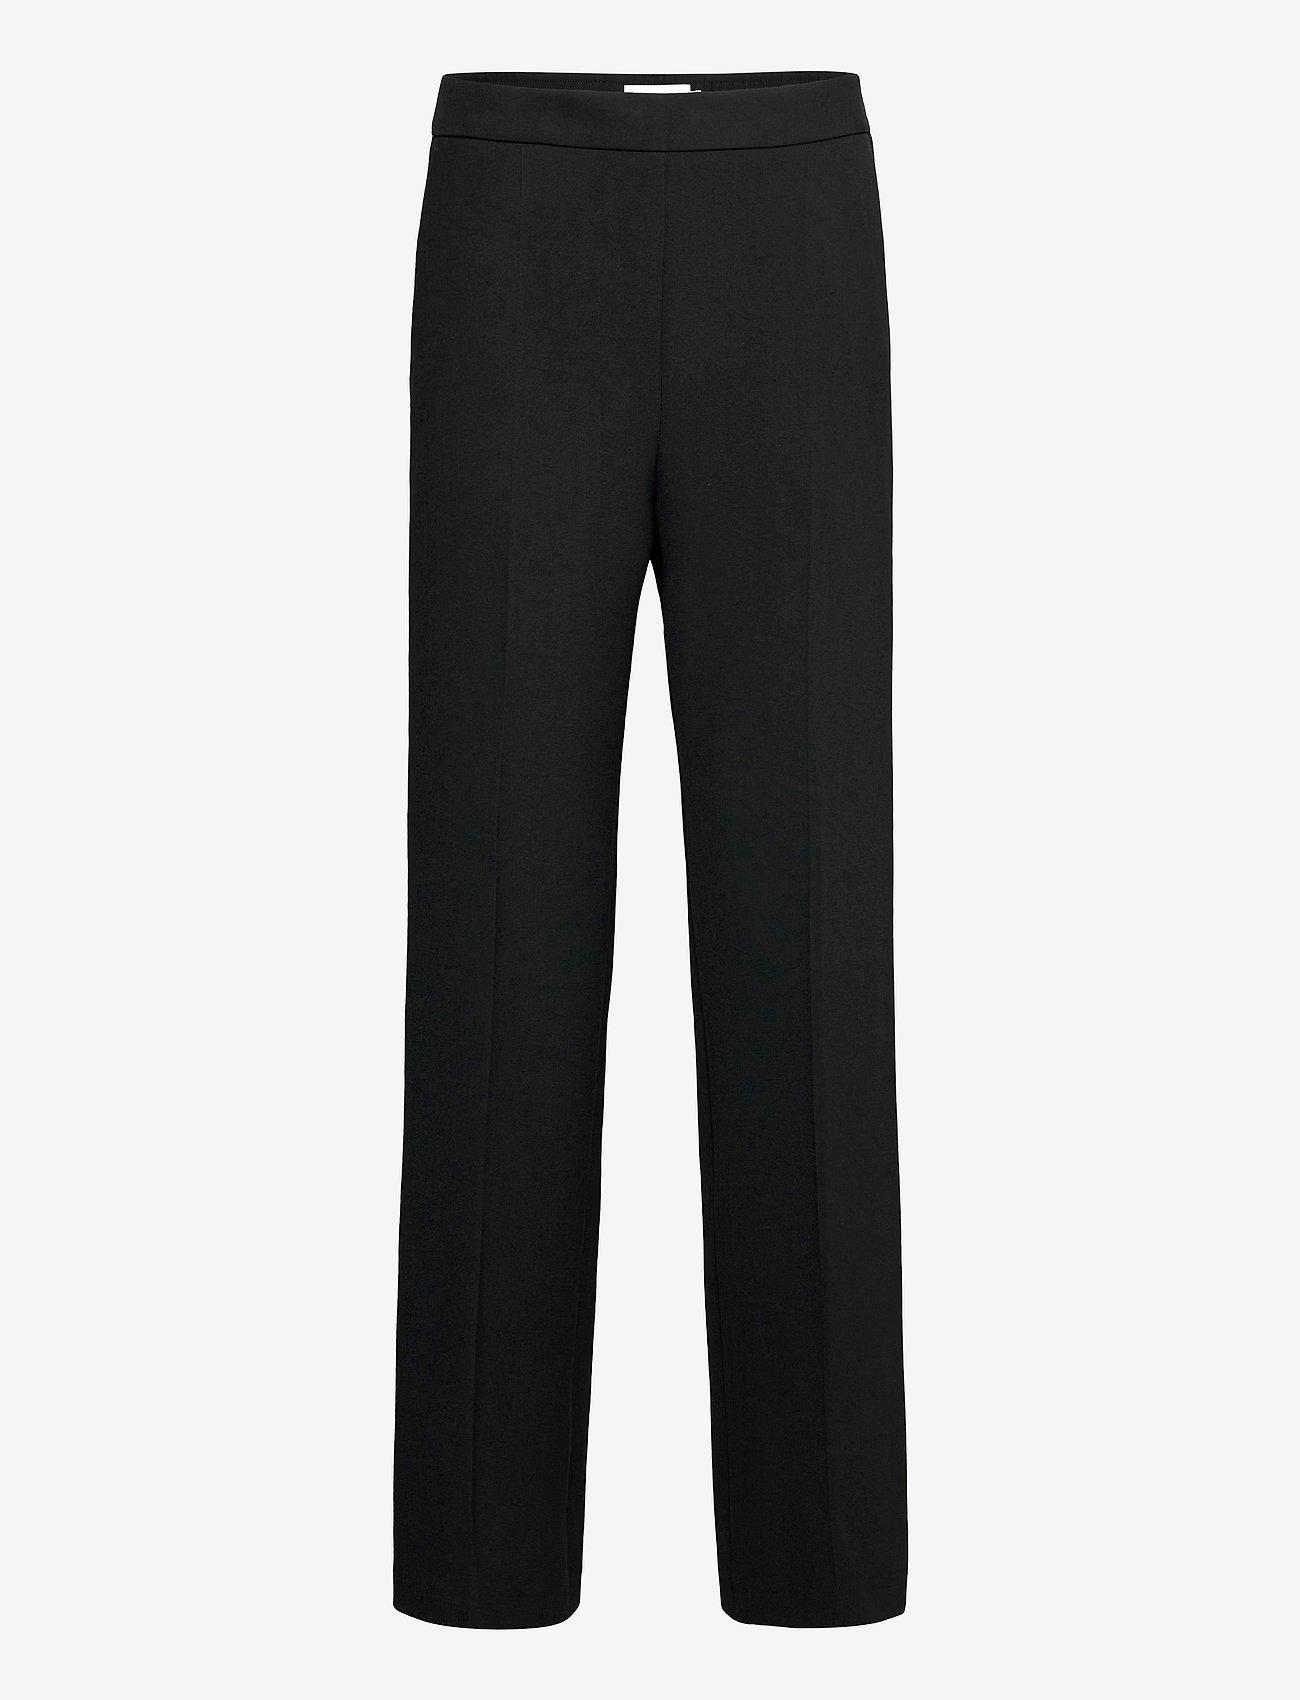 Marimekko - HAKKU LONG SOLID TROUSERS - bukser med lige ben - black - 0